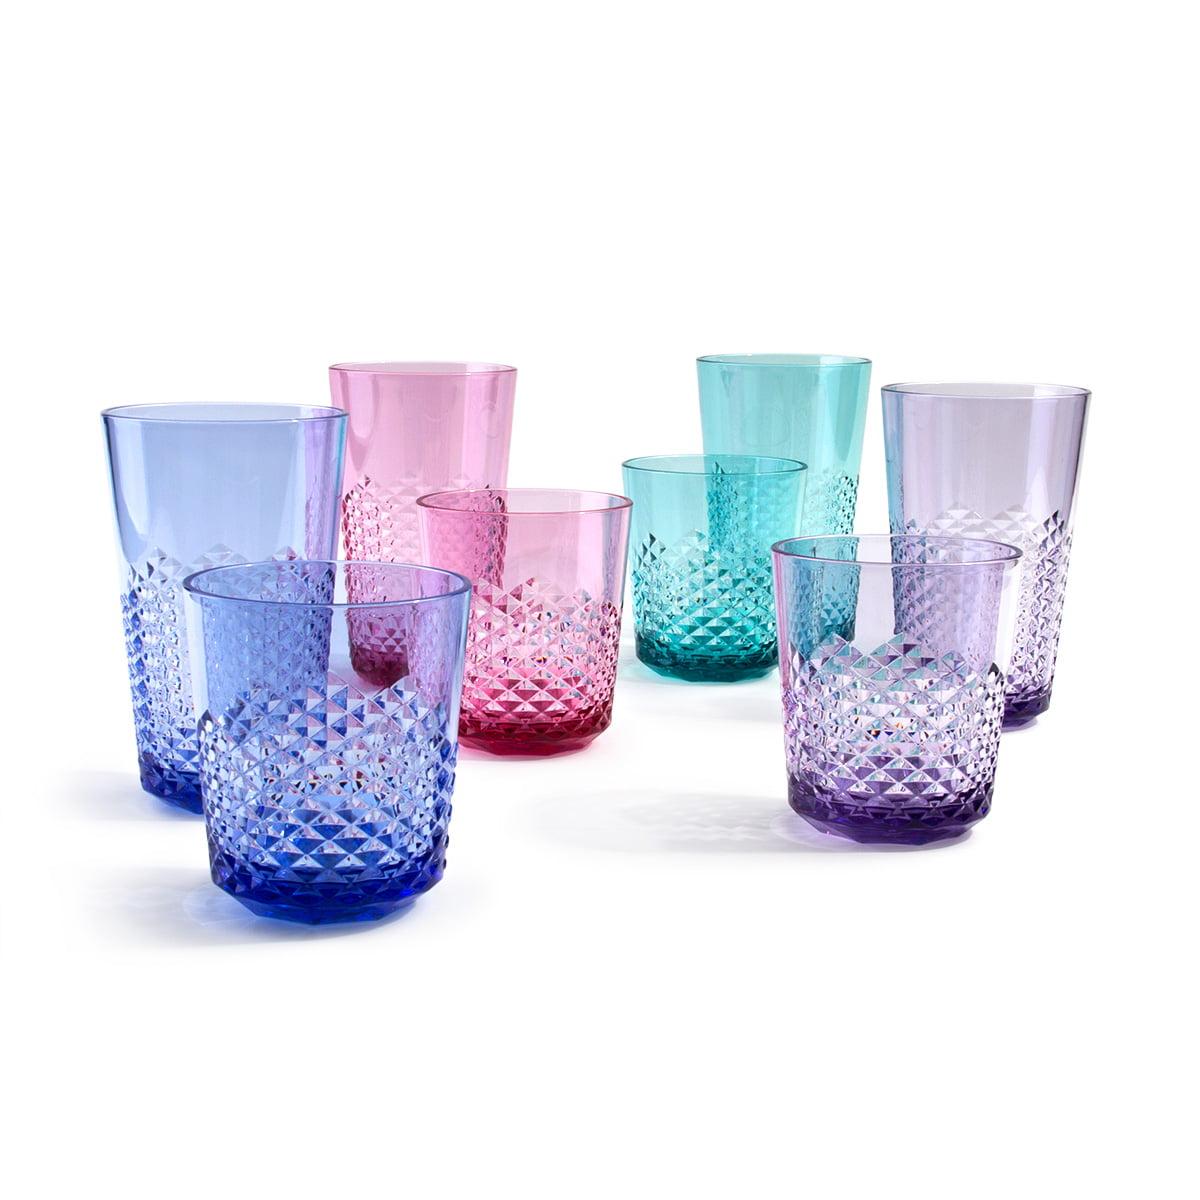 Cupture Diamond Plastic Tumblers, 24 oz / 14 oz, 8-Pack (Assorted Colors)